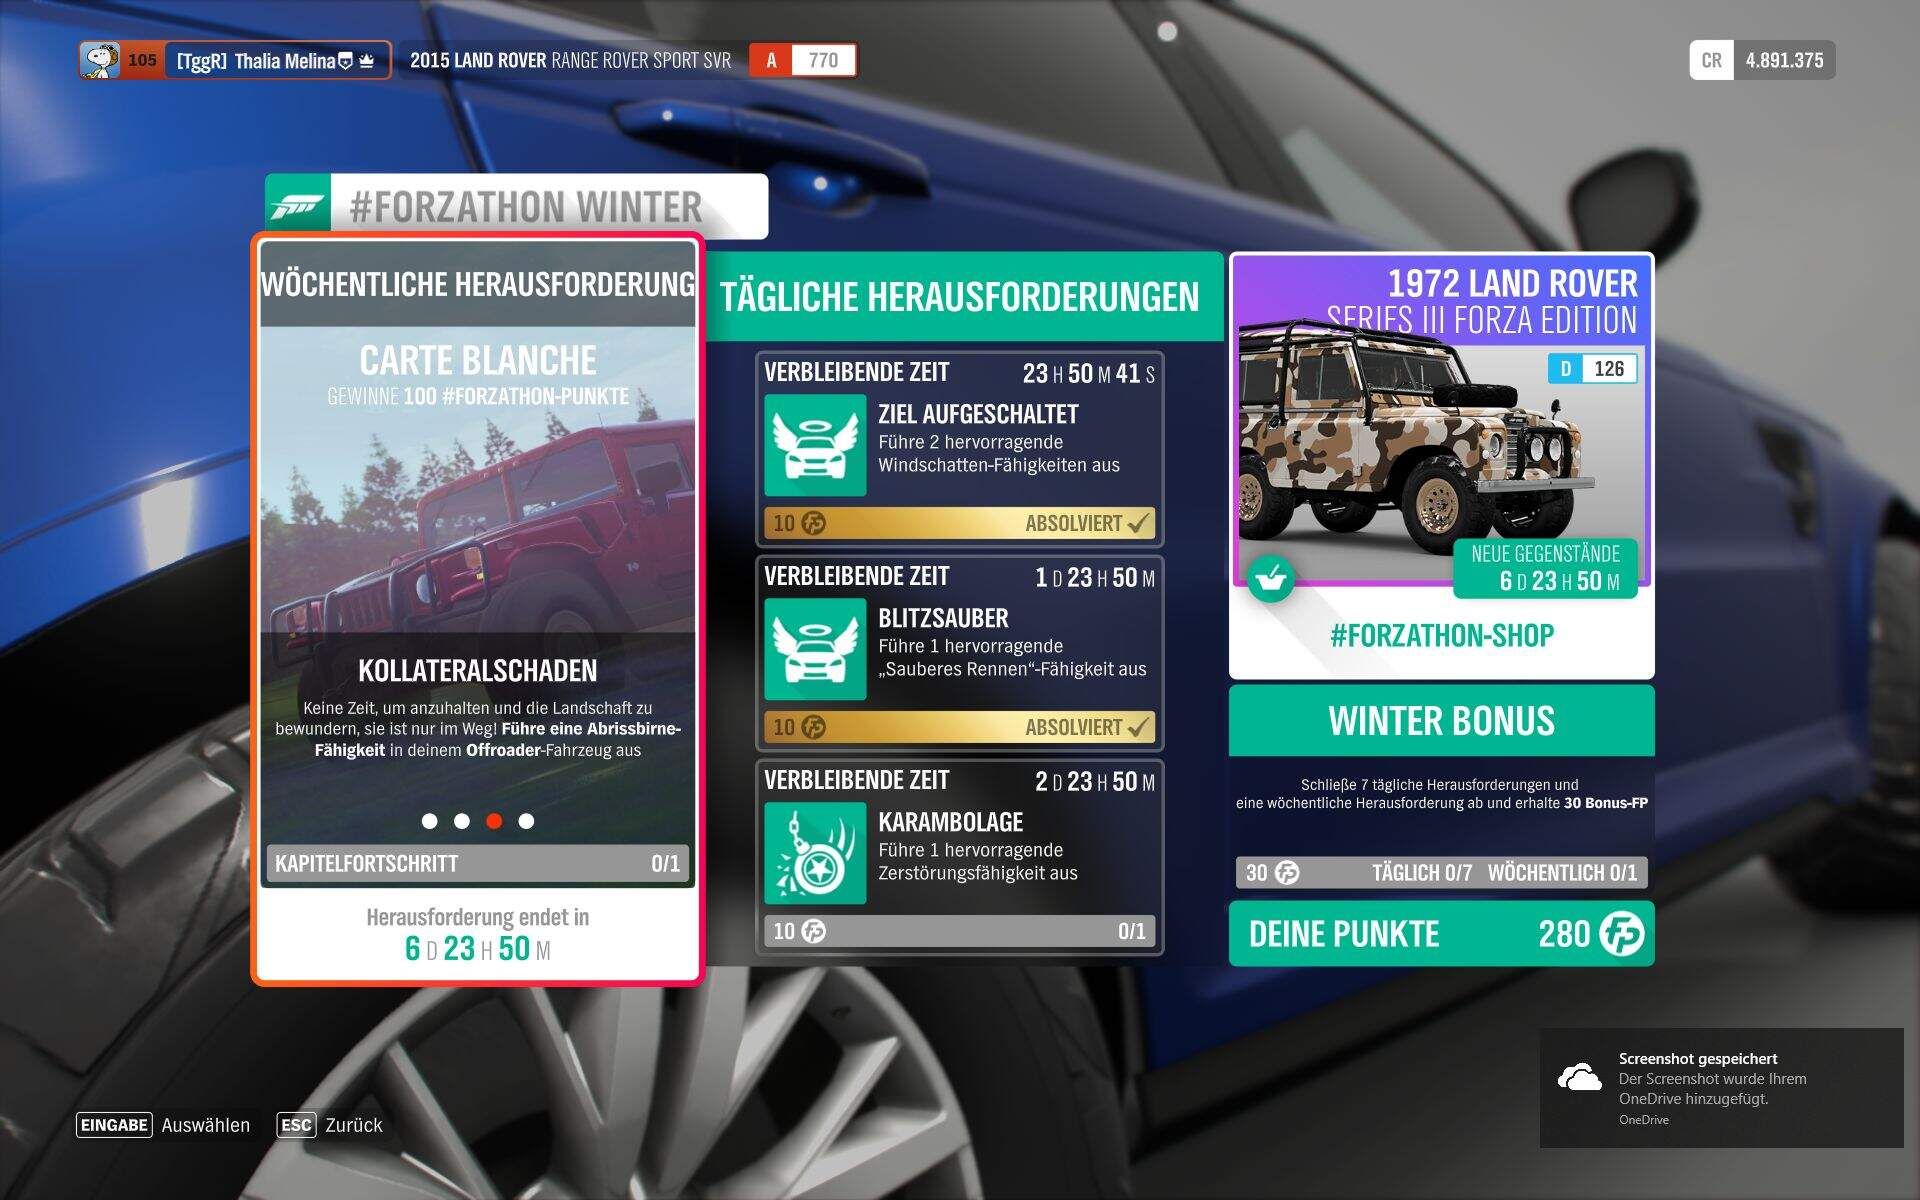 Forza Horizon 4 #Forzathon Guide KW 41 – Carte Blanche Aufgabe 3